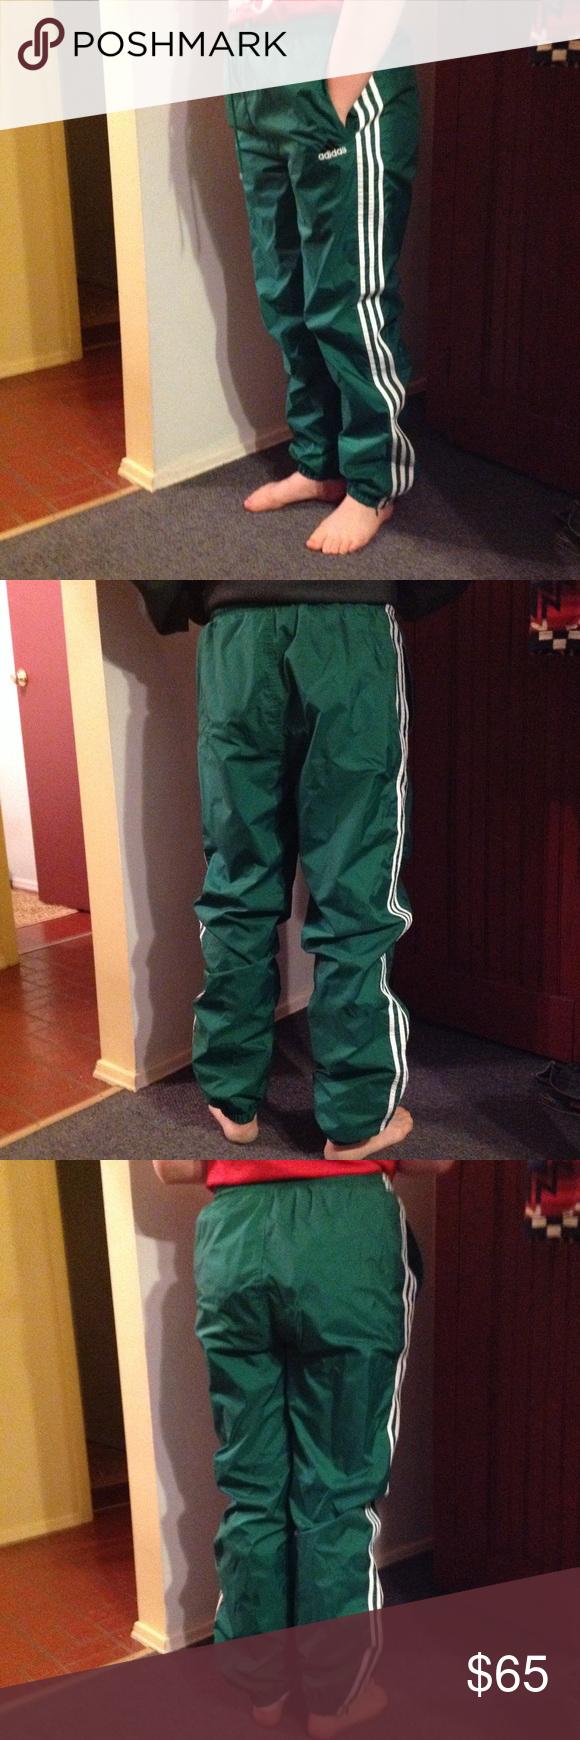 Vintage Green Adidas Track Pants Unisex Joggers M Nice pair